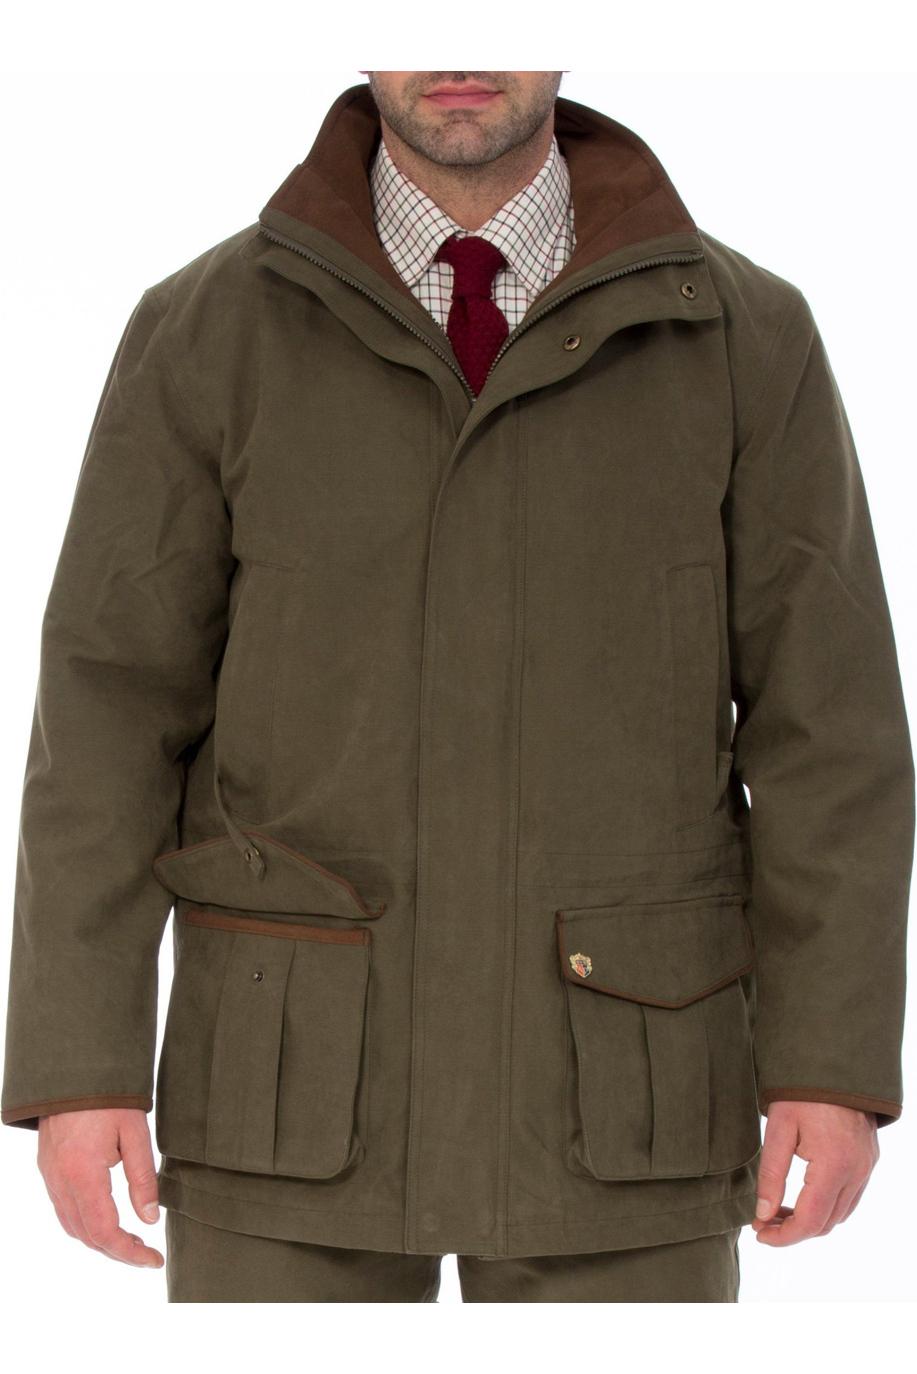 7b8b35e3d Alan Paine Mens Jacket Berwick Waterproof Shooting Olive | Mens ...